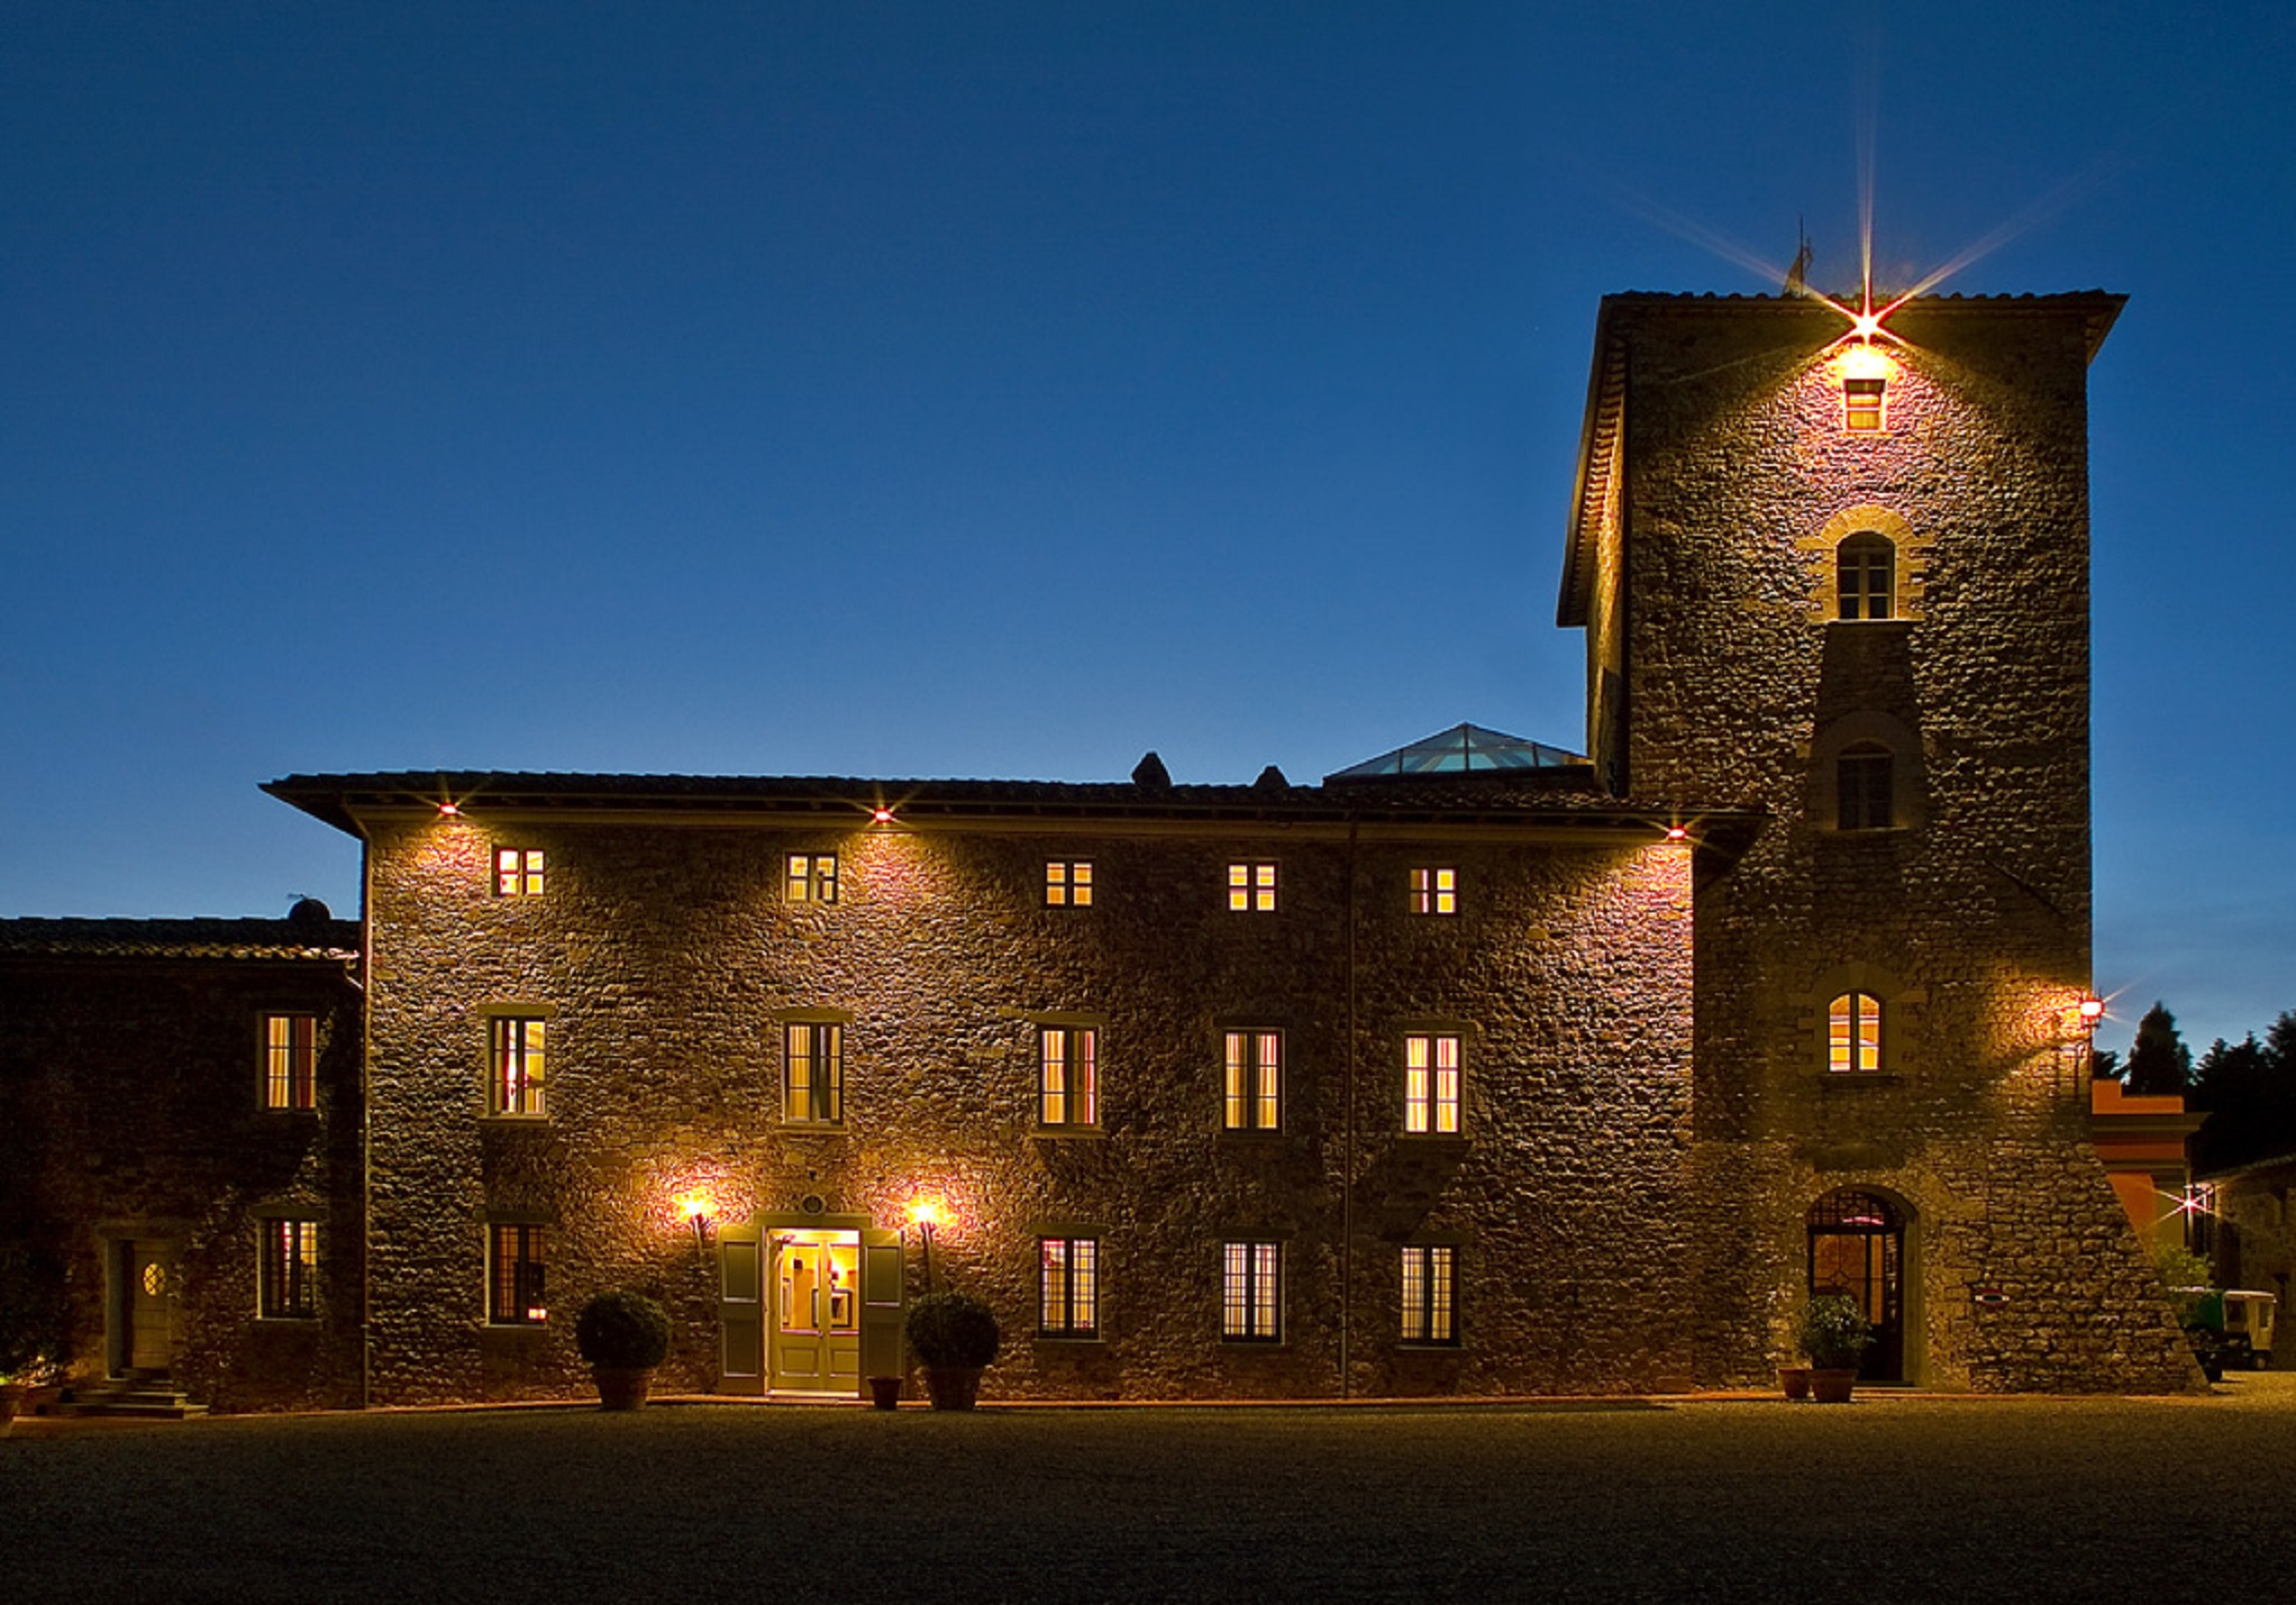 Location Matrimonio Toscana : Agriturismi e ville per matrimoni in toscana